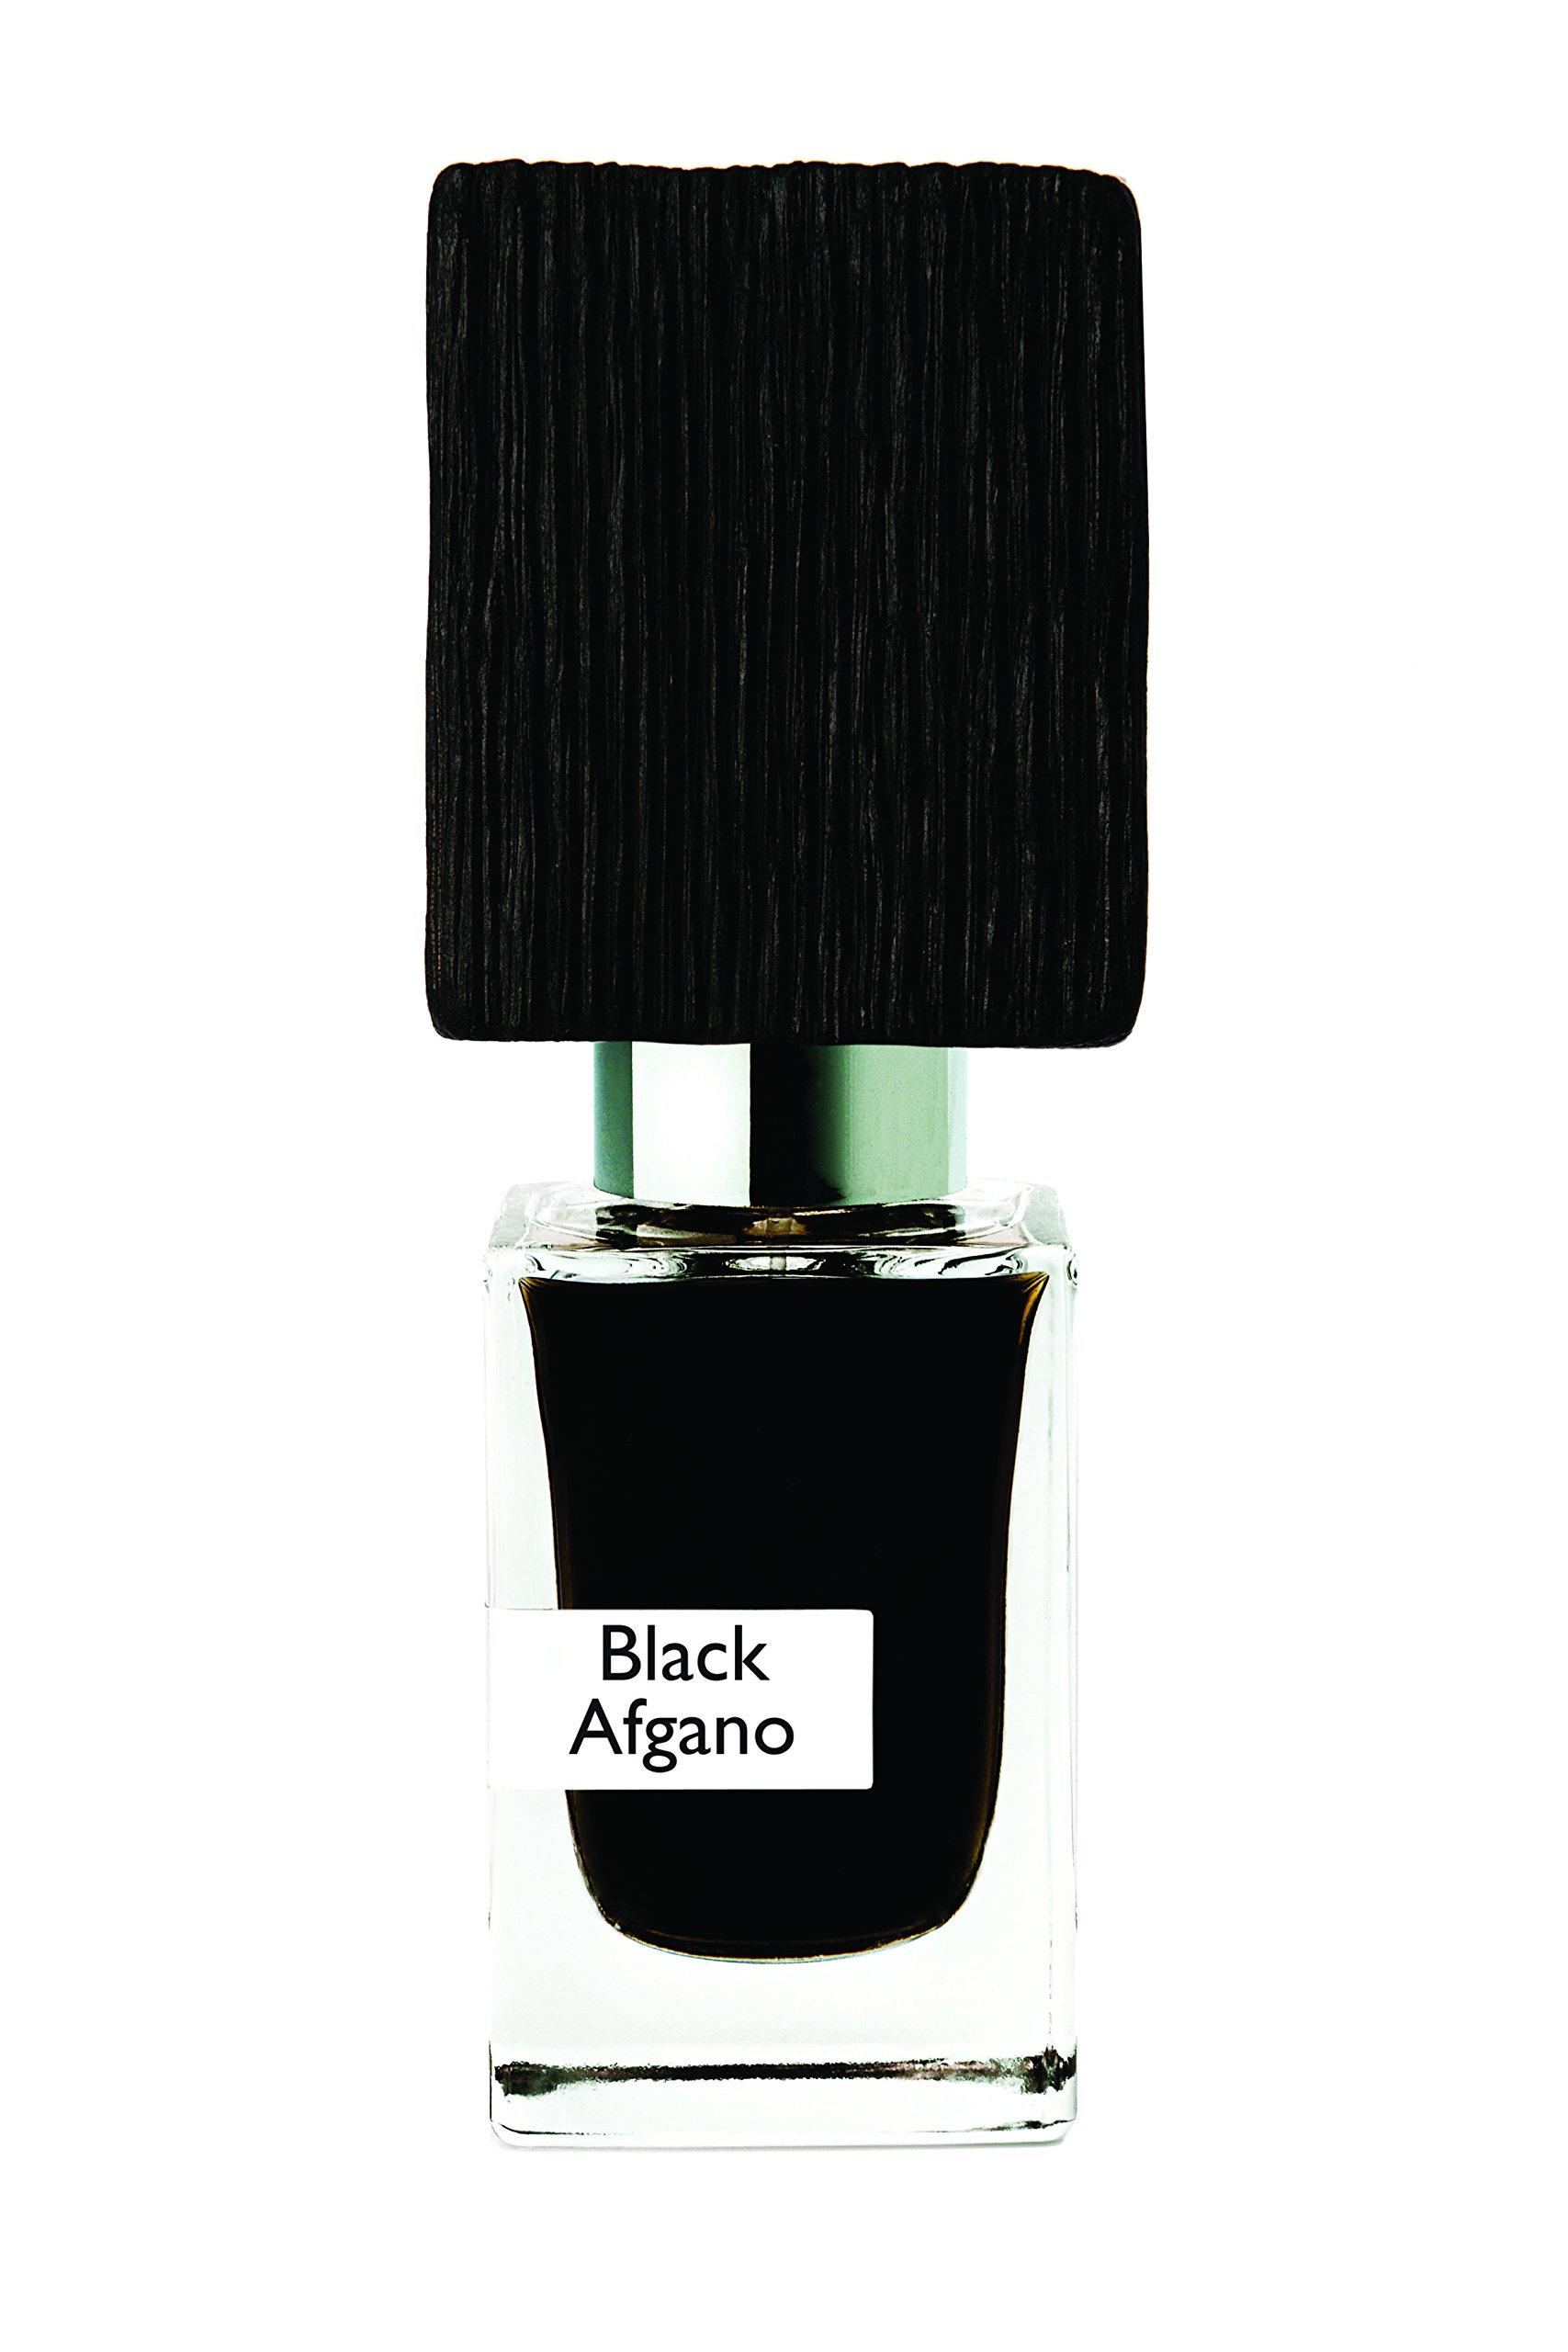 Nasomatto Black Afgano 1.0 oz Extrait de Parfum Spray